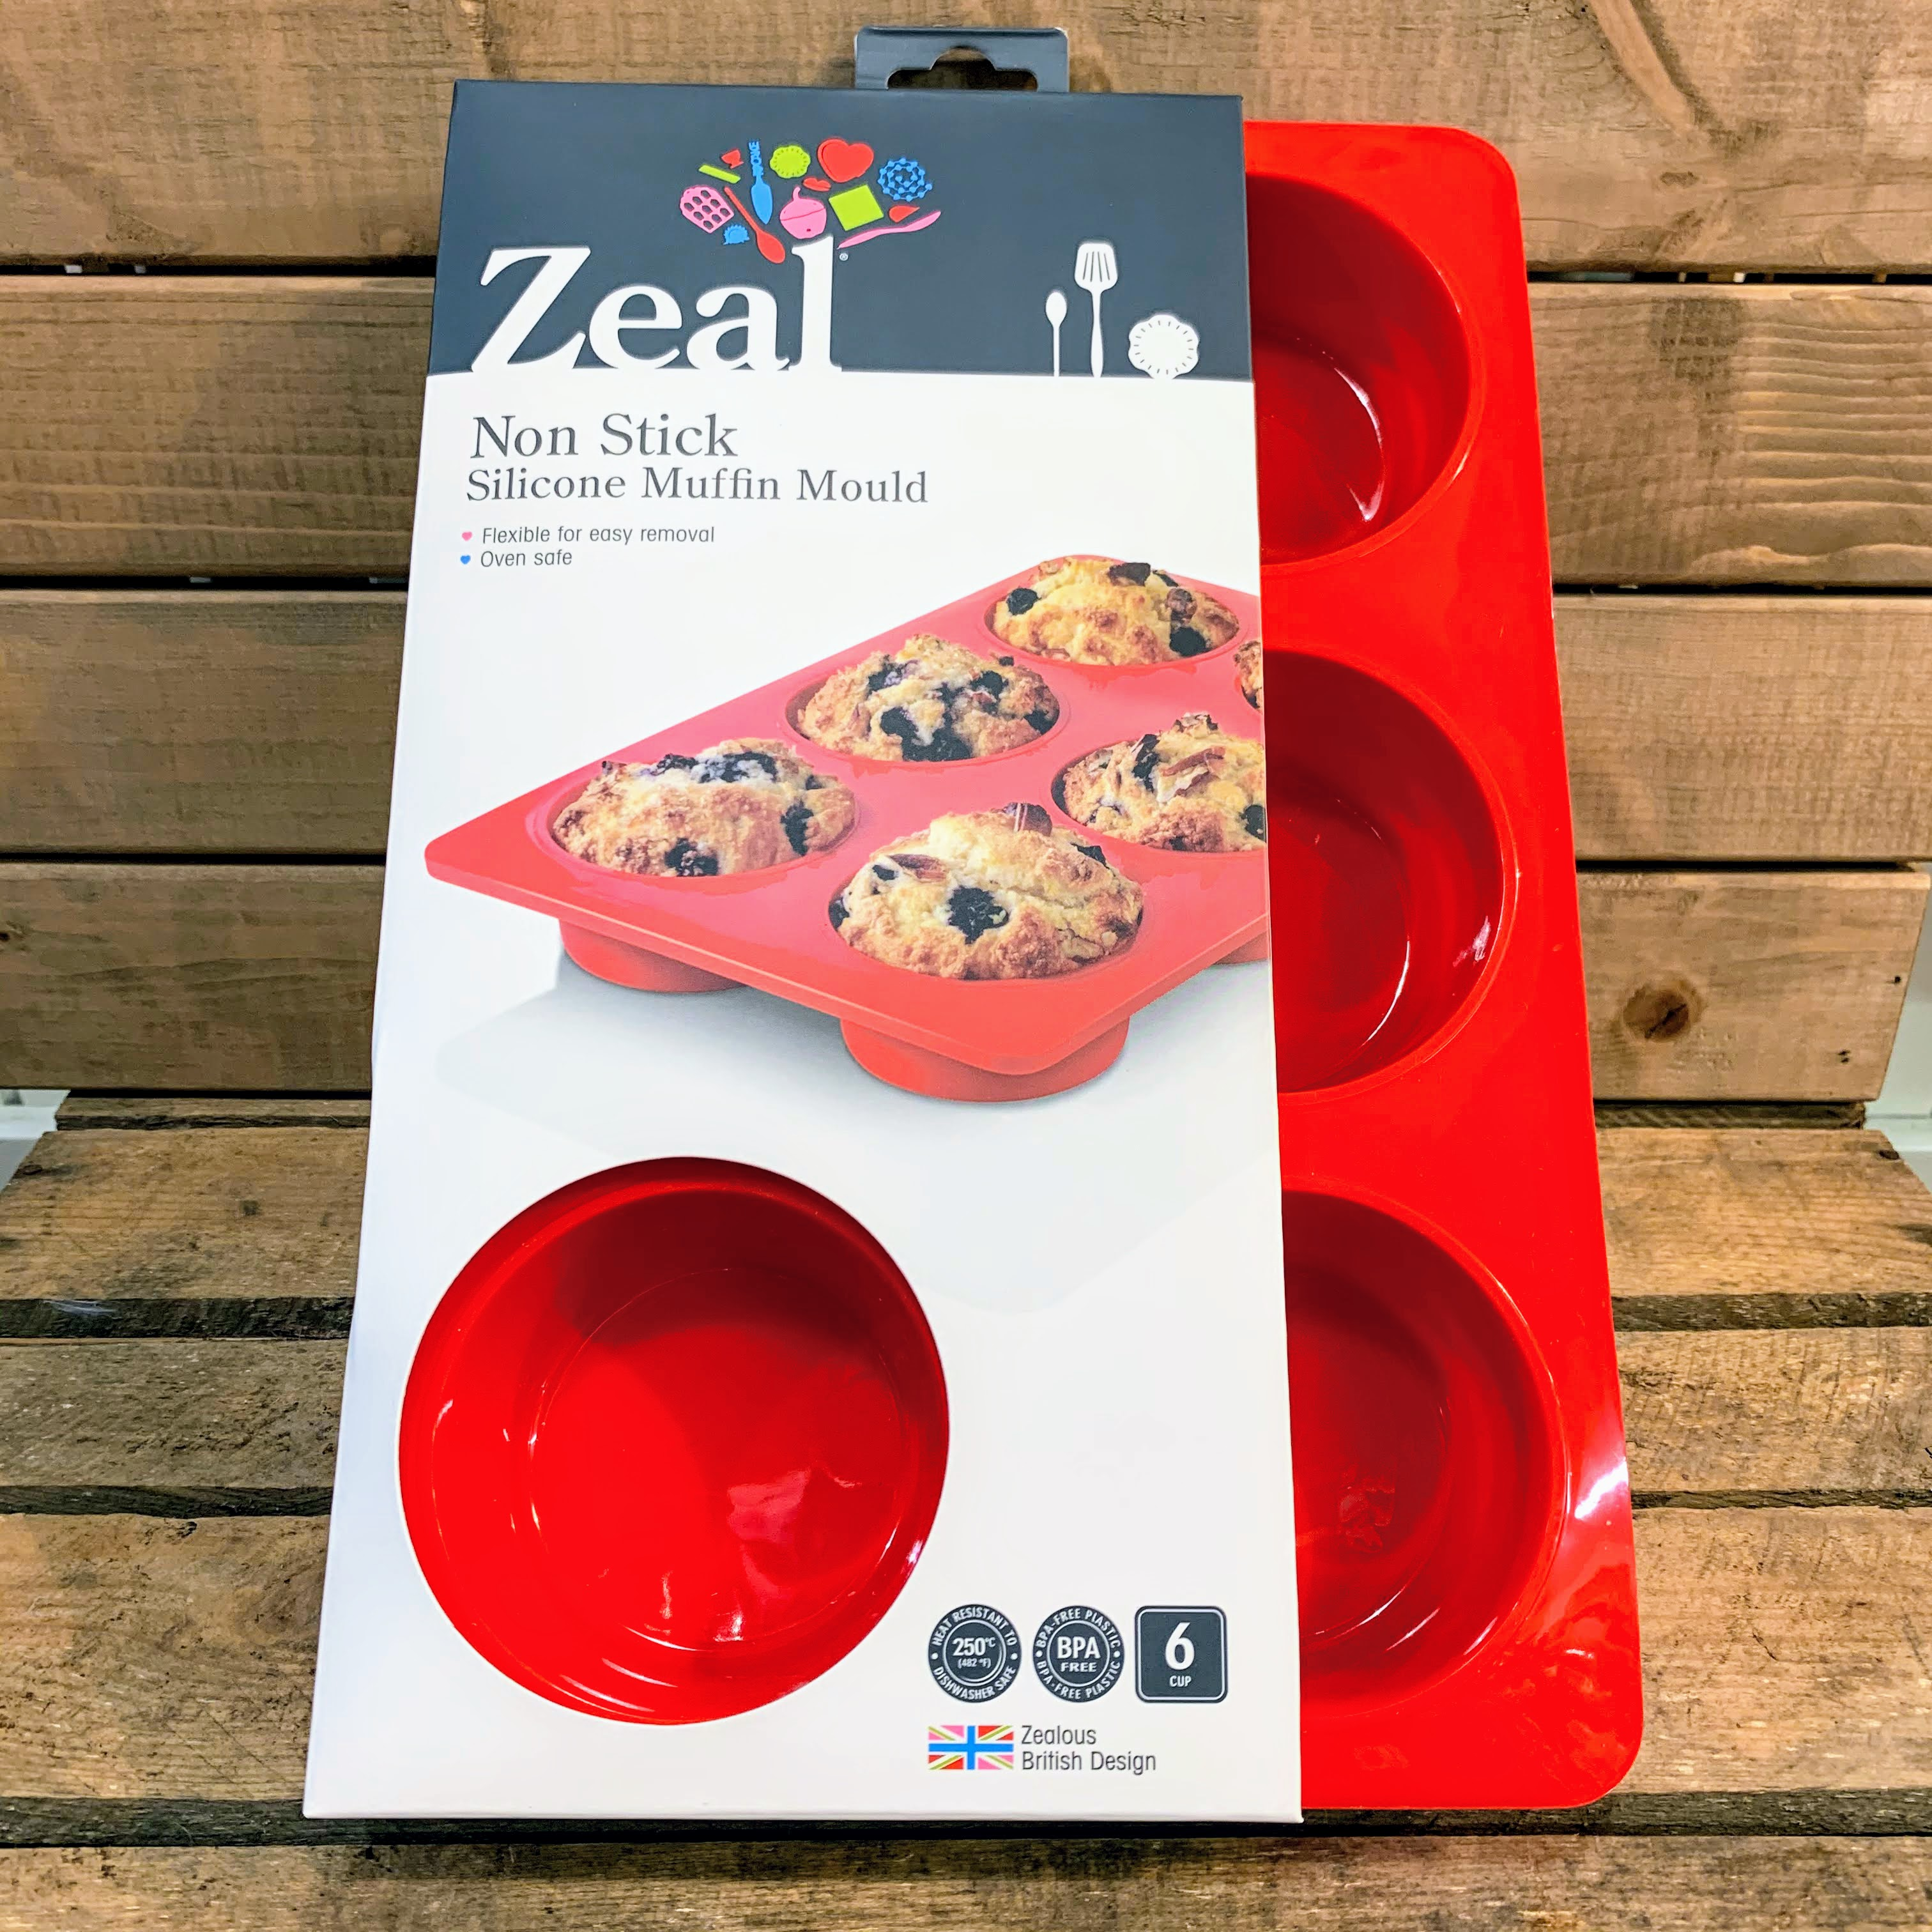 Zeal Non Stick Silicone Muffin Mould